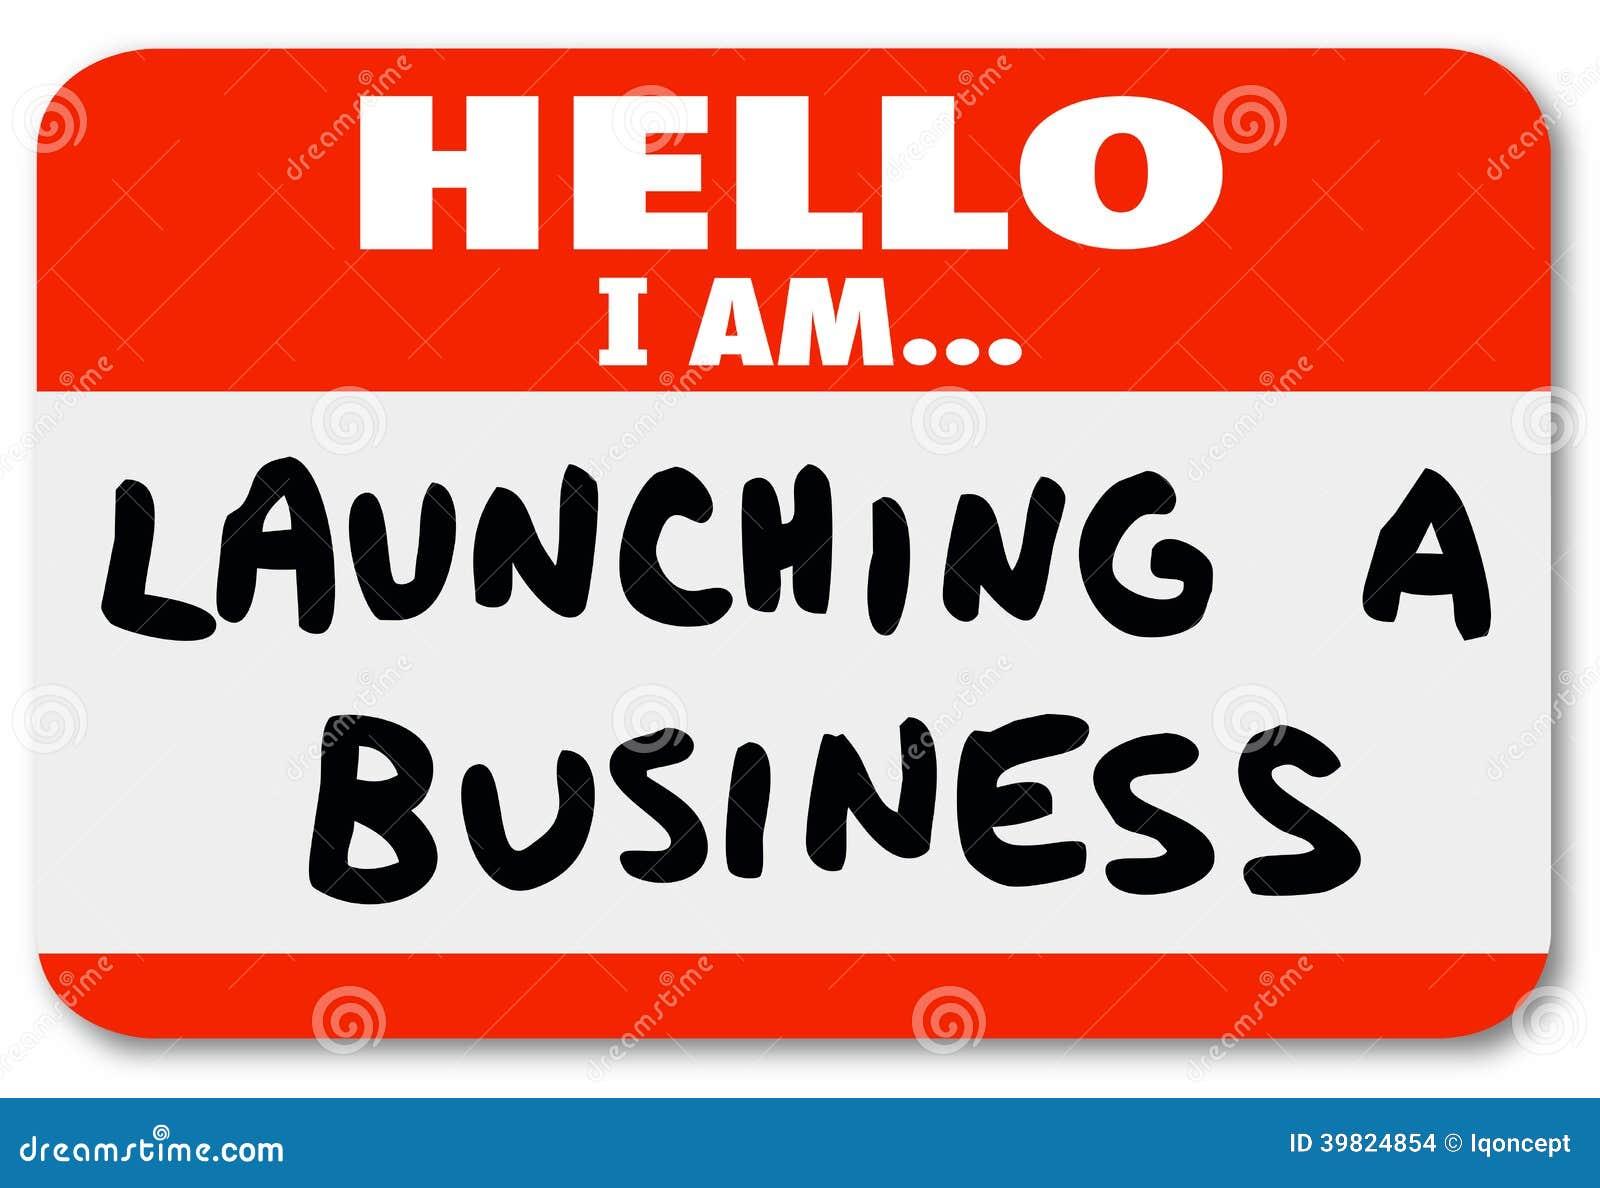 Animation company business plan